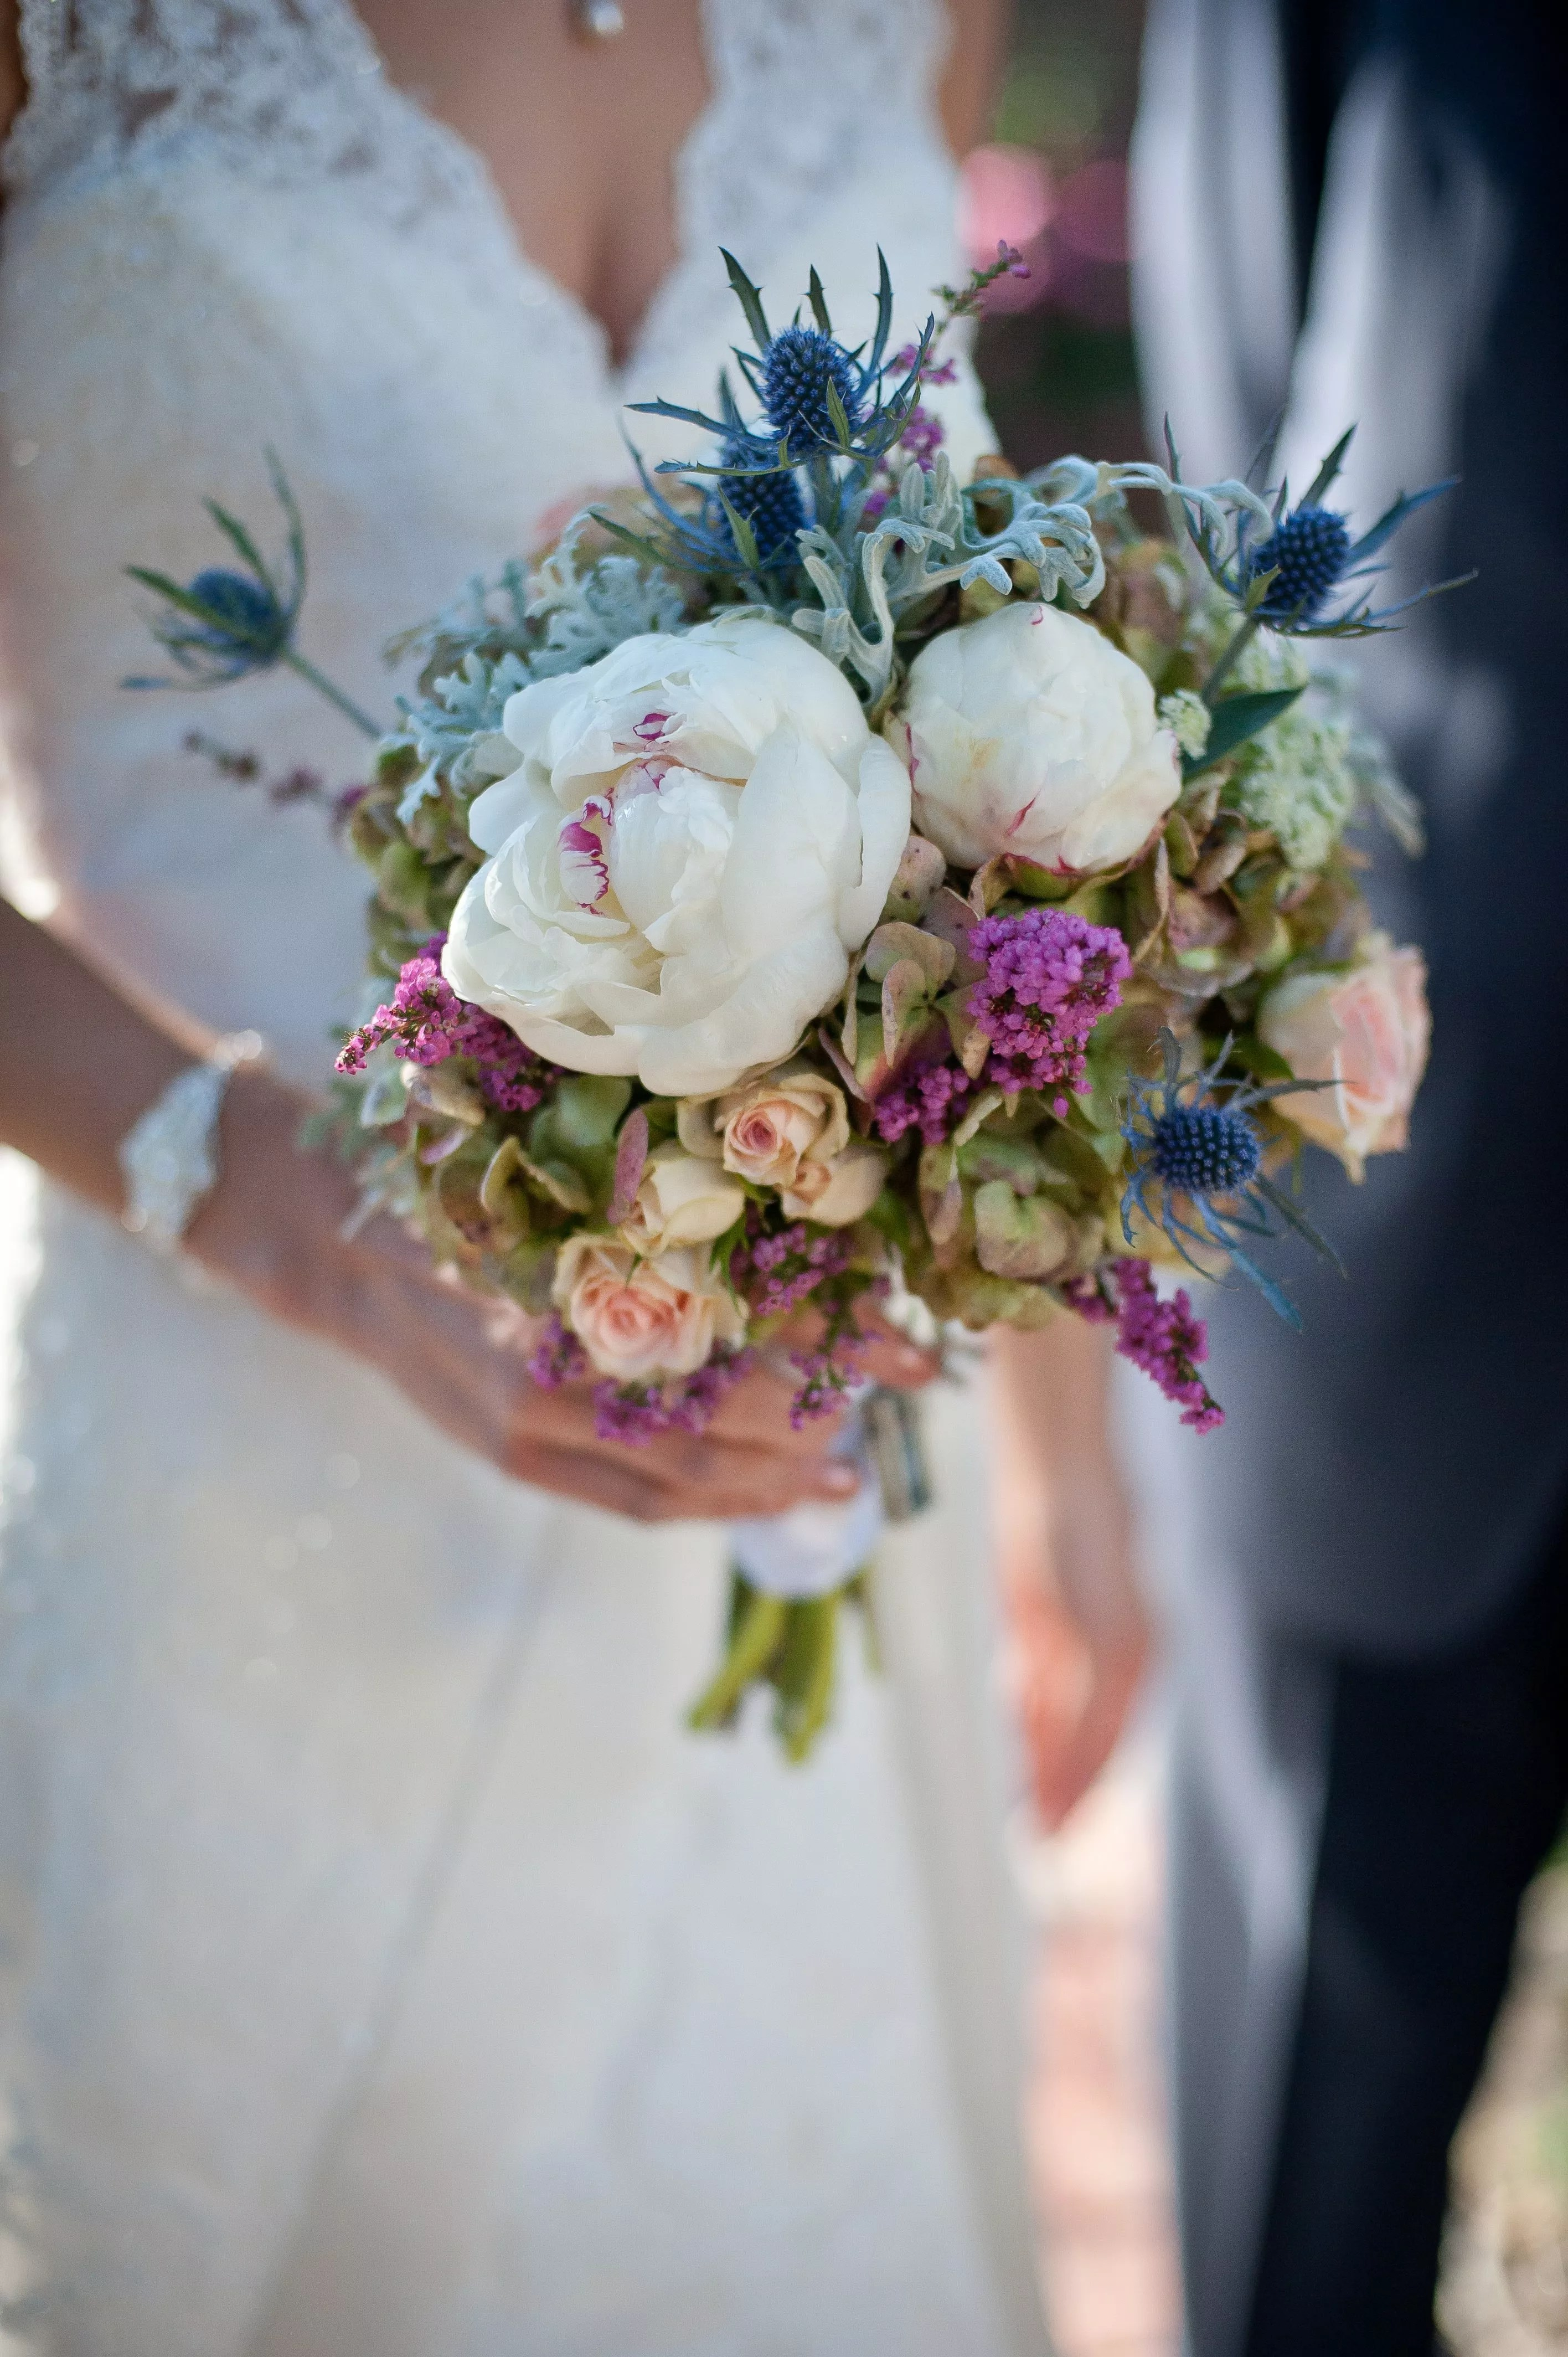 Sea Holly Bridal Bouquet